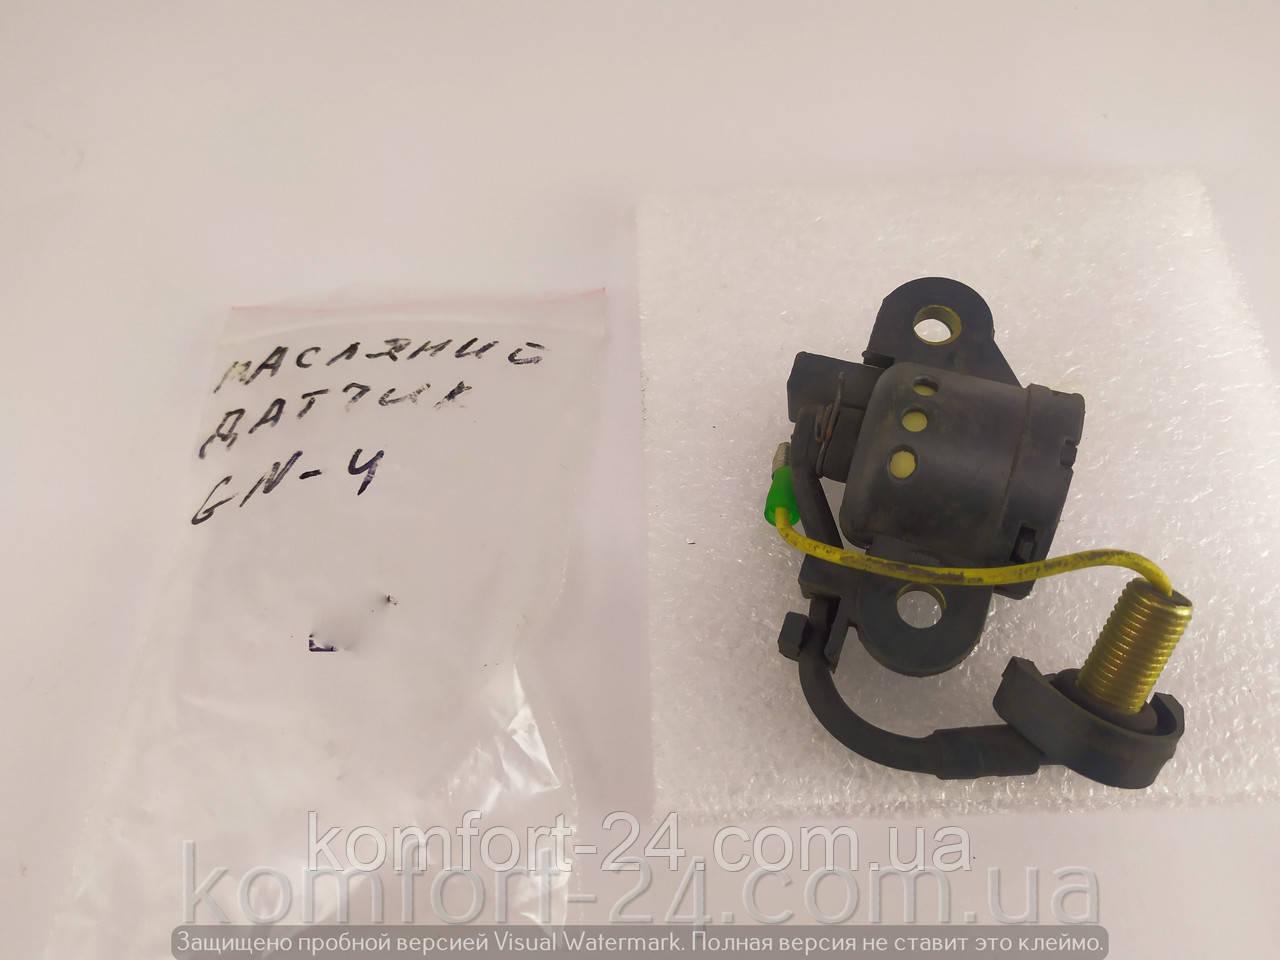 Масляний датчик до двигуна мотоблока GN-4